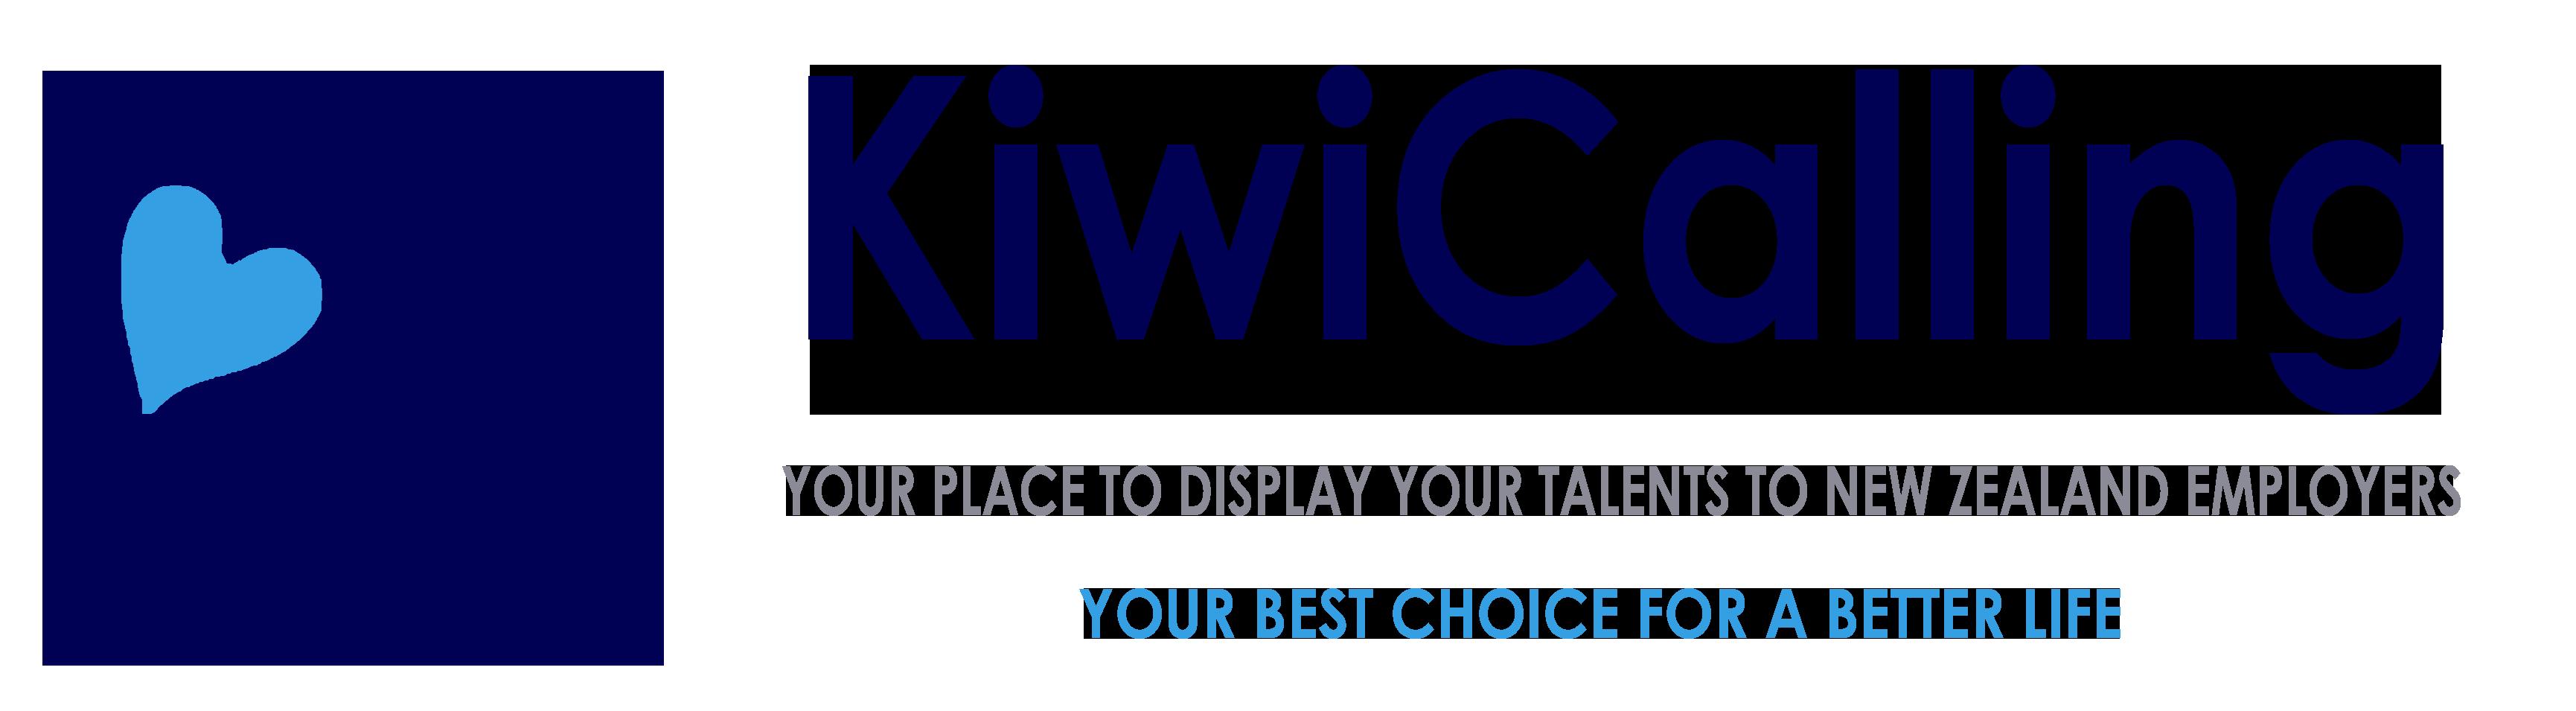 Kiwi Calling